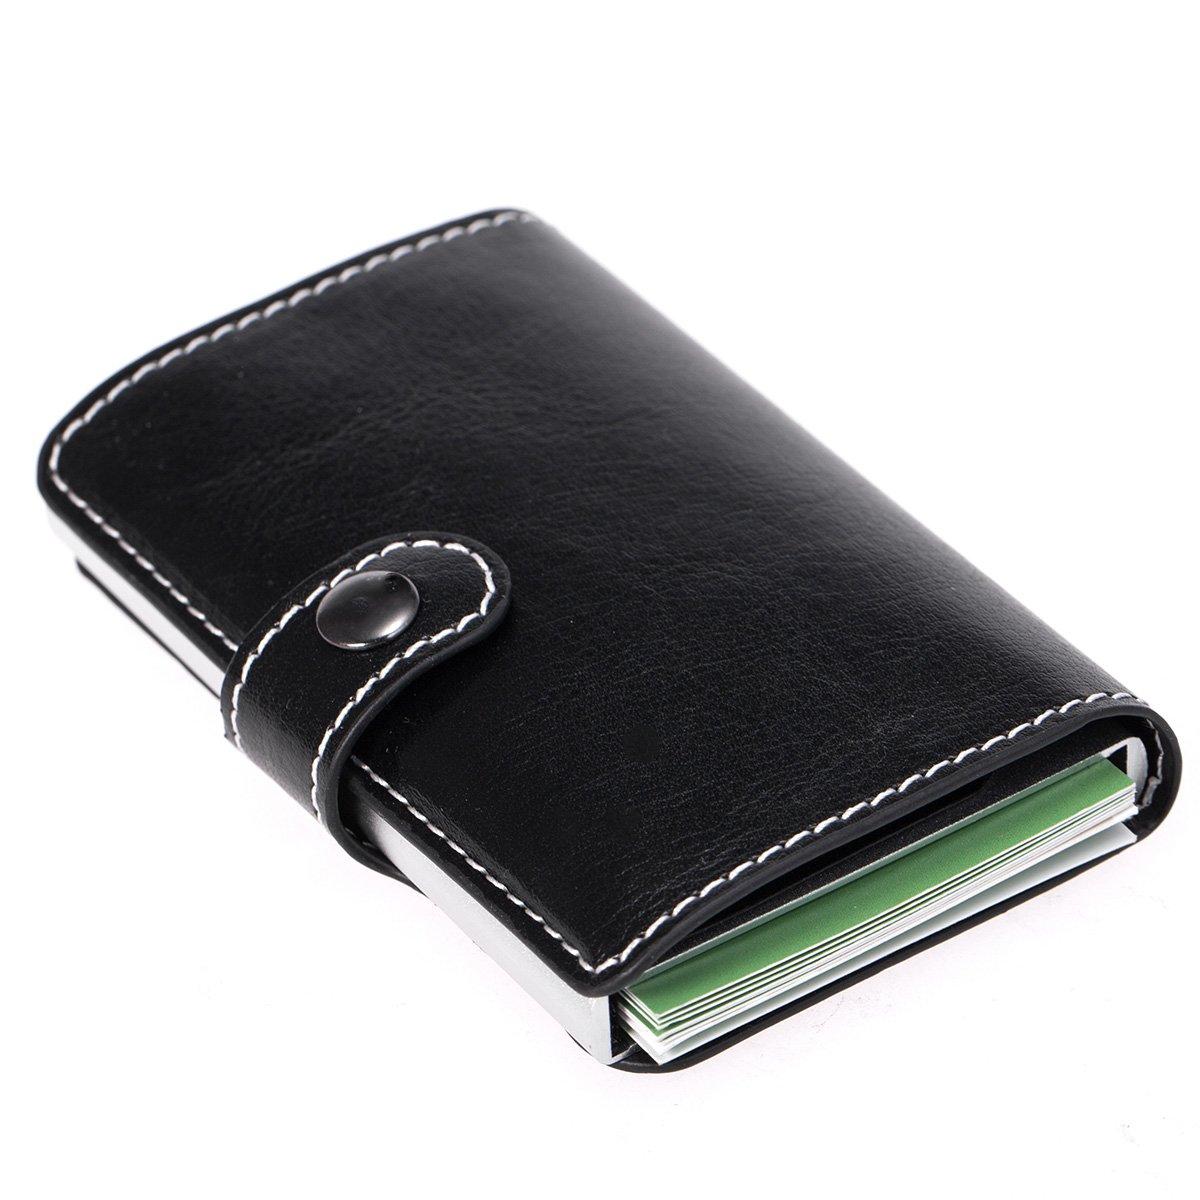 SIBOSUN Wallet Leather Slim RFID Safe Card Holder Case Automatic Pop-Up